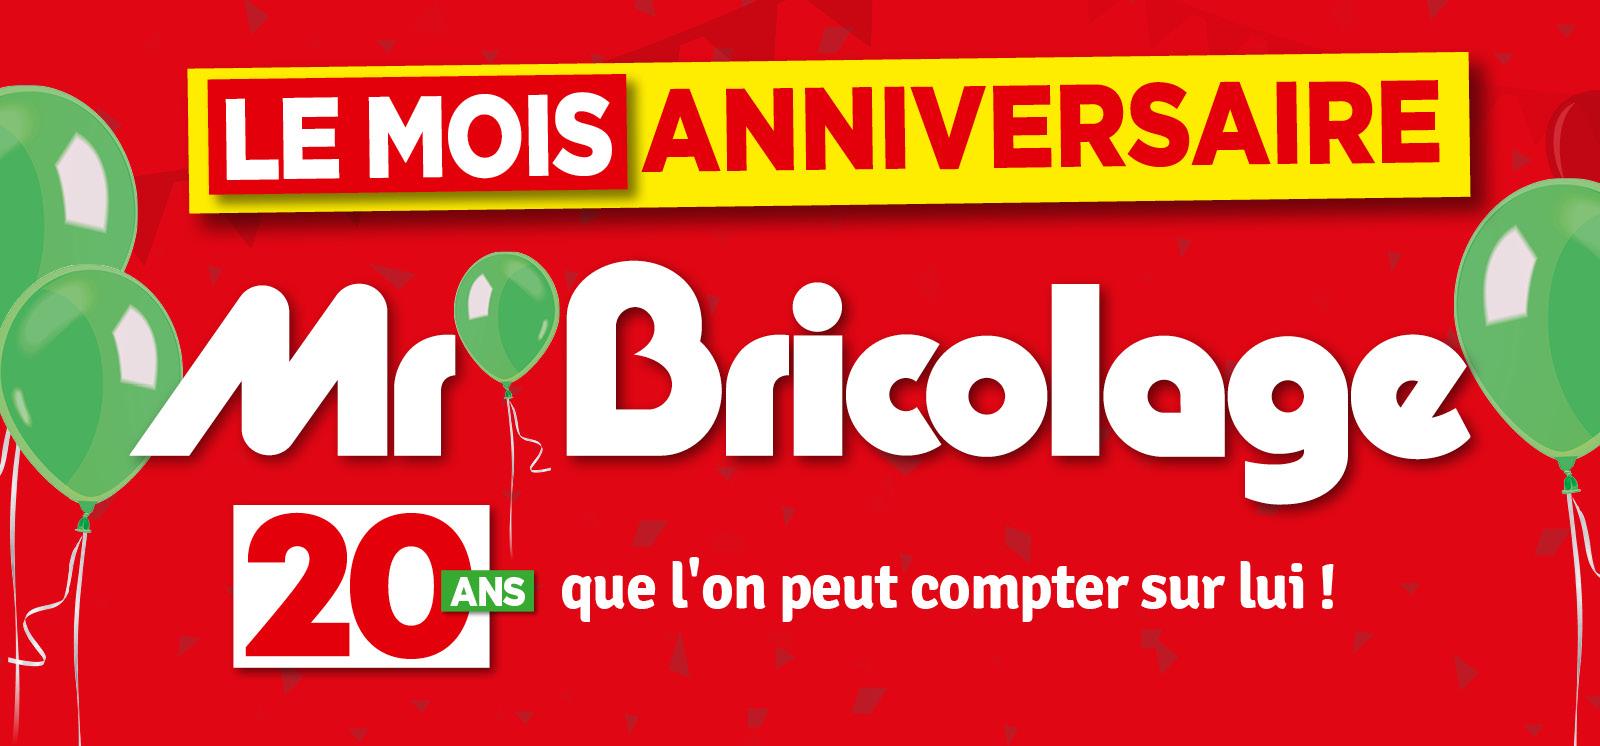 Promo - Mois anniversaire 20 ans Mr.Bricolage